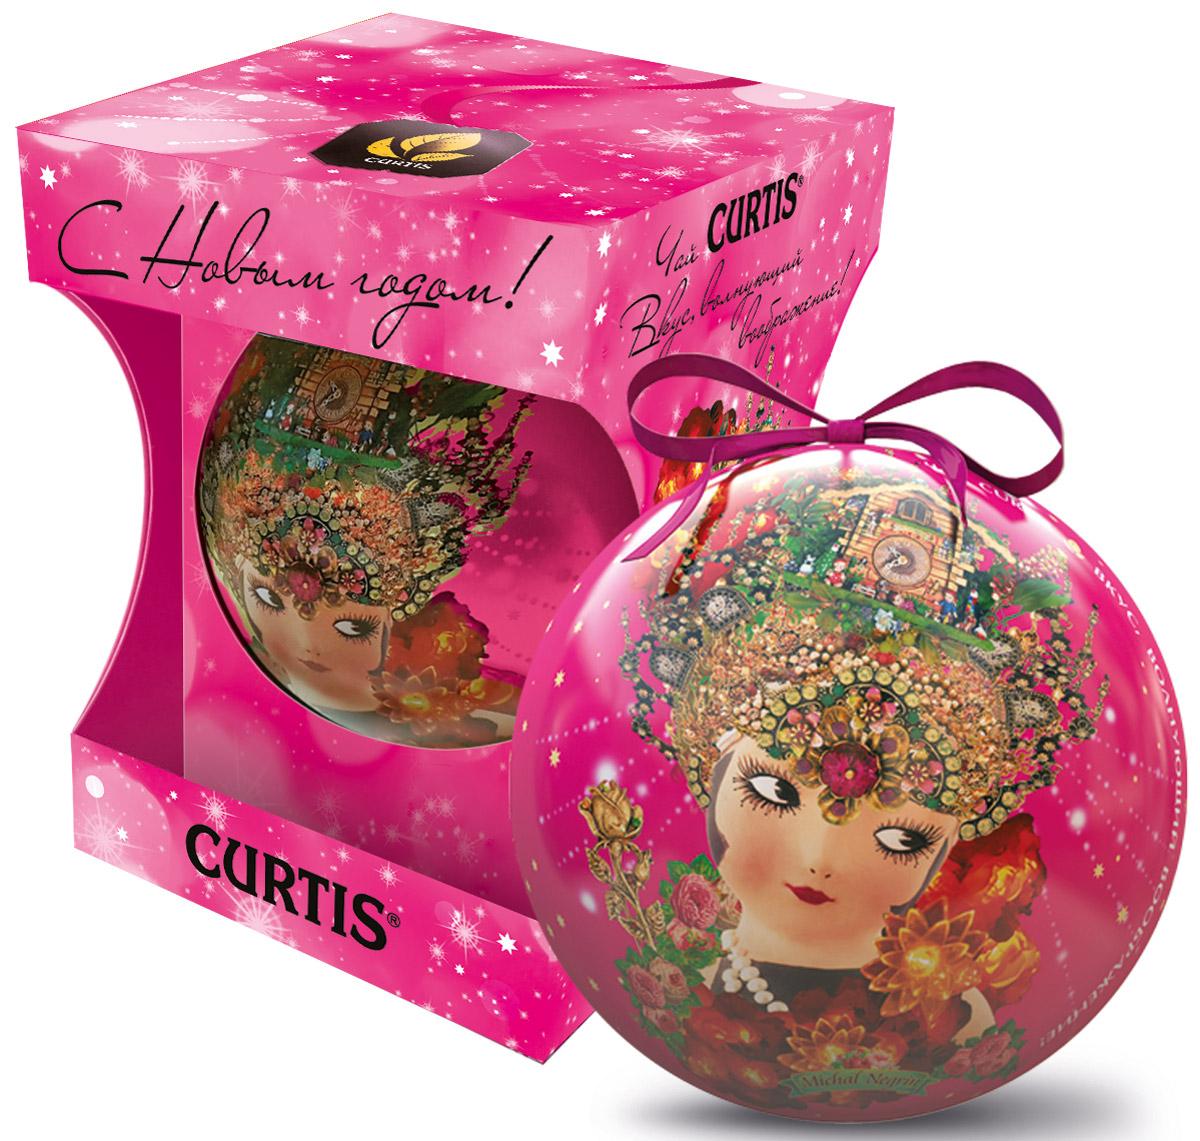 Curtis She-Shy Christmas Ball розовый, черный листовой чай, 30 г greenfield christmas mystery черный листовой чай 100 г